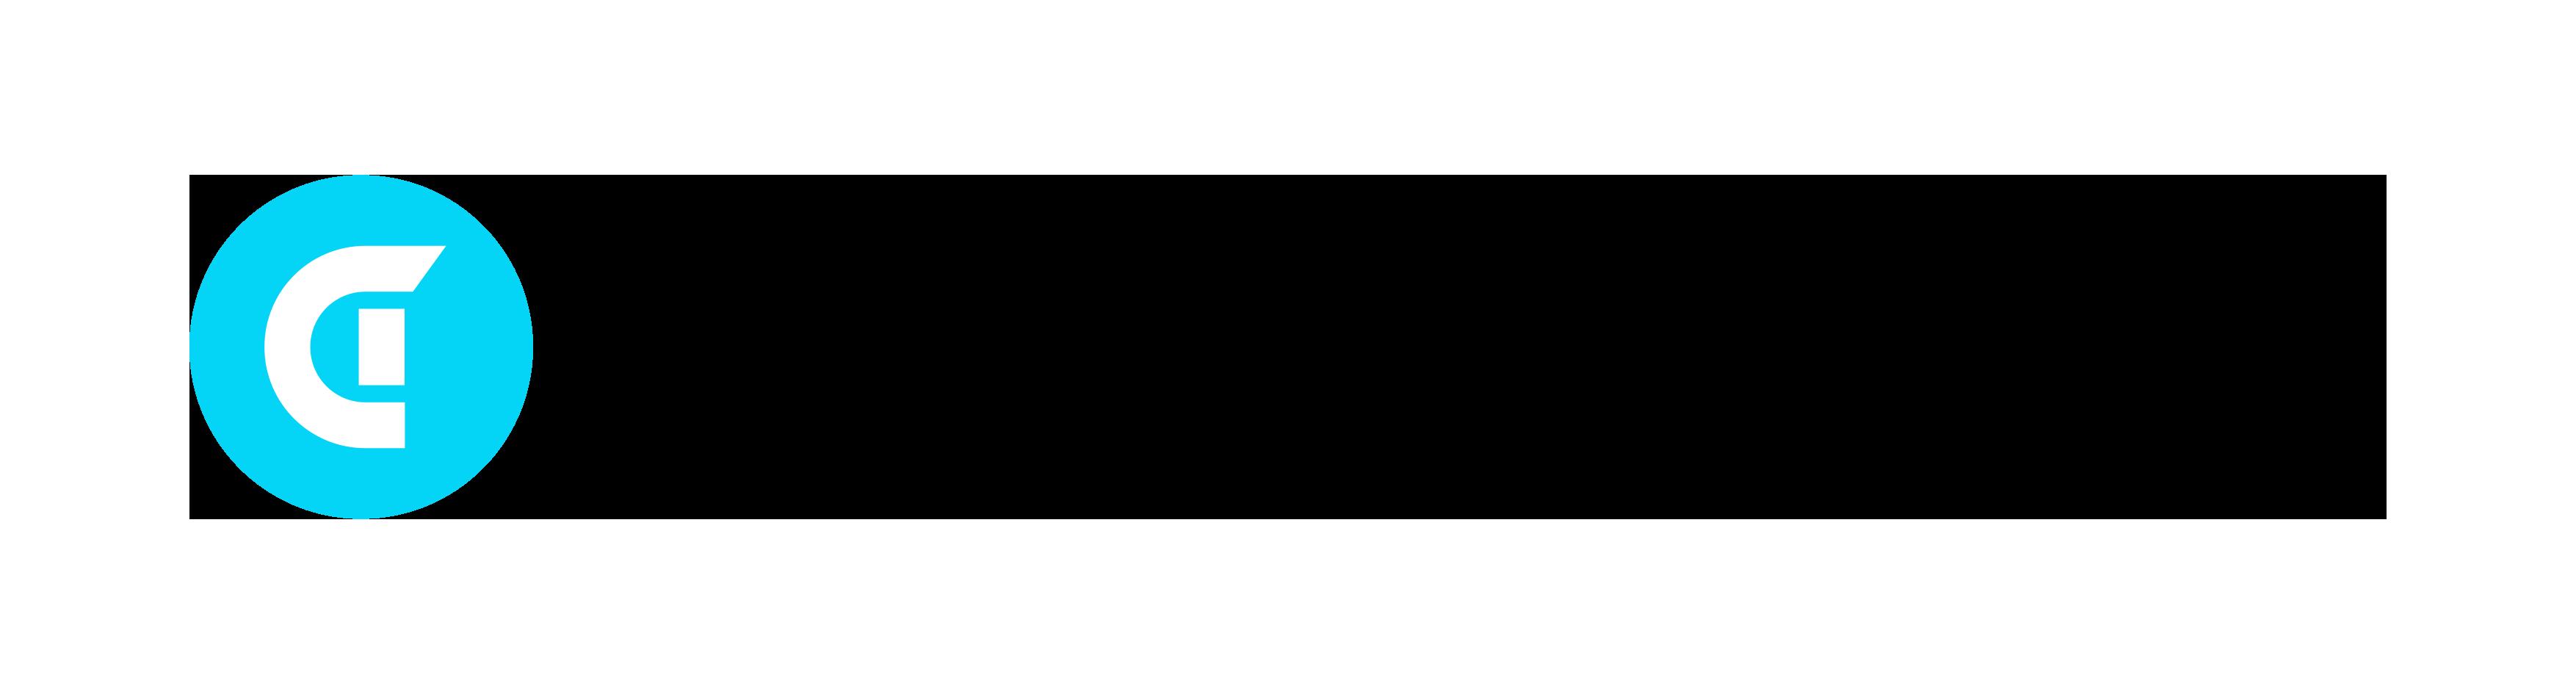 CoachTools_RGB_vari_vaaka (002)